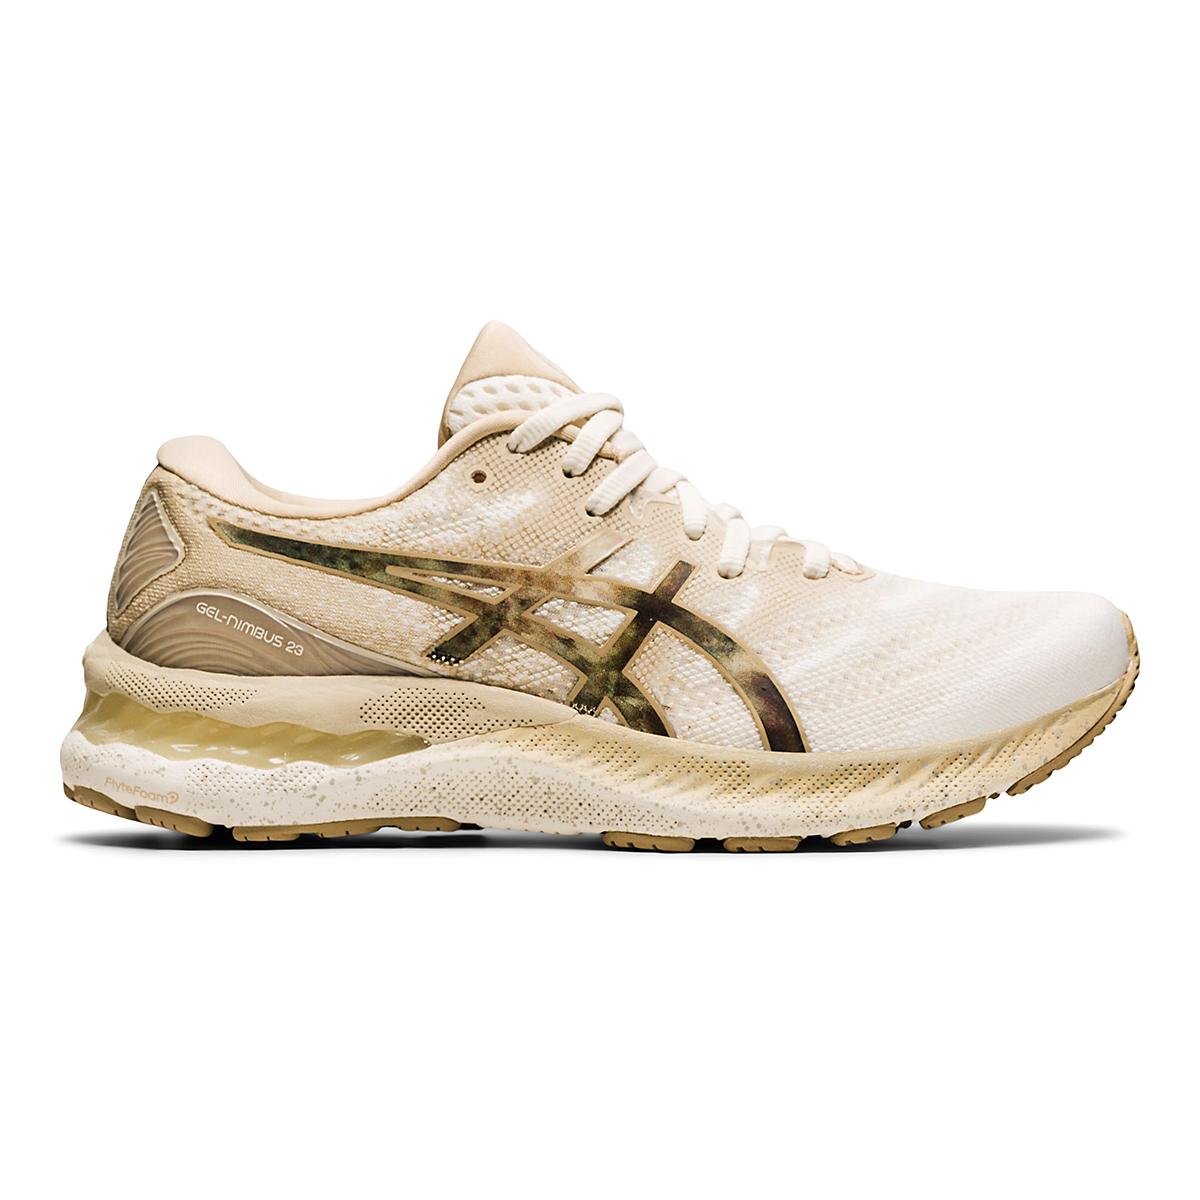 Women's Asics Gel-Nimbus 23 Earth Day Running Shoe - Color: Cream/Putty - Size: 5 - Width: Regular, Cream/Putty, large, image 1